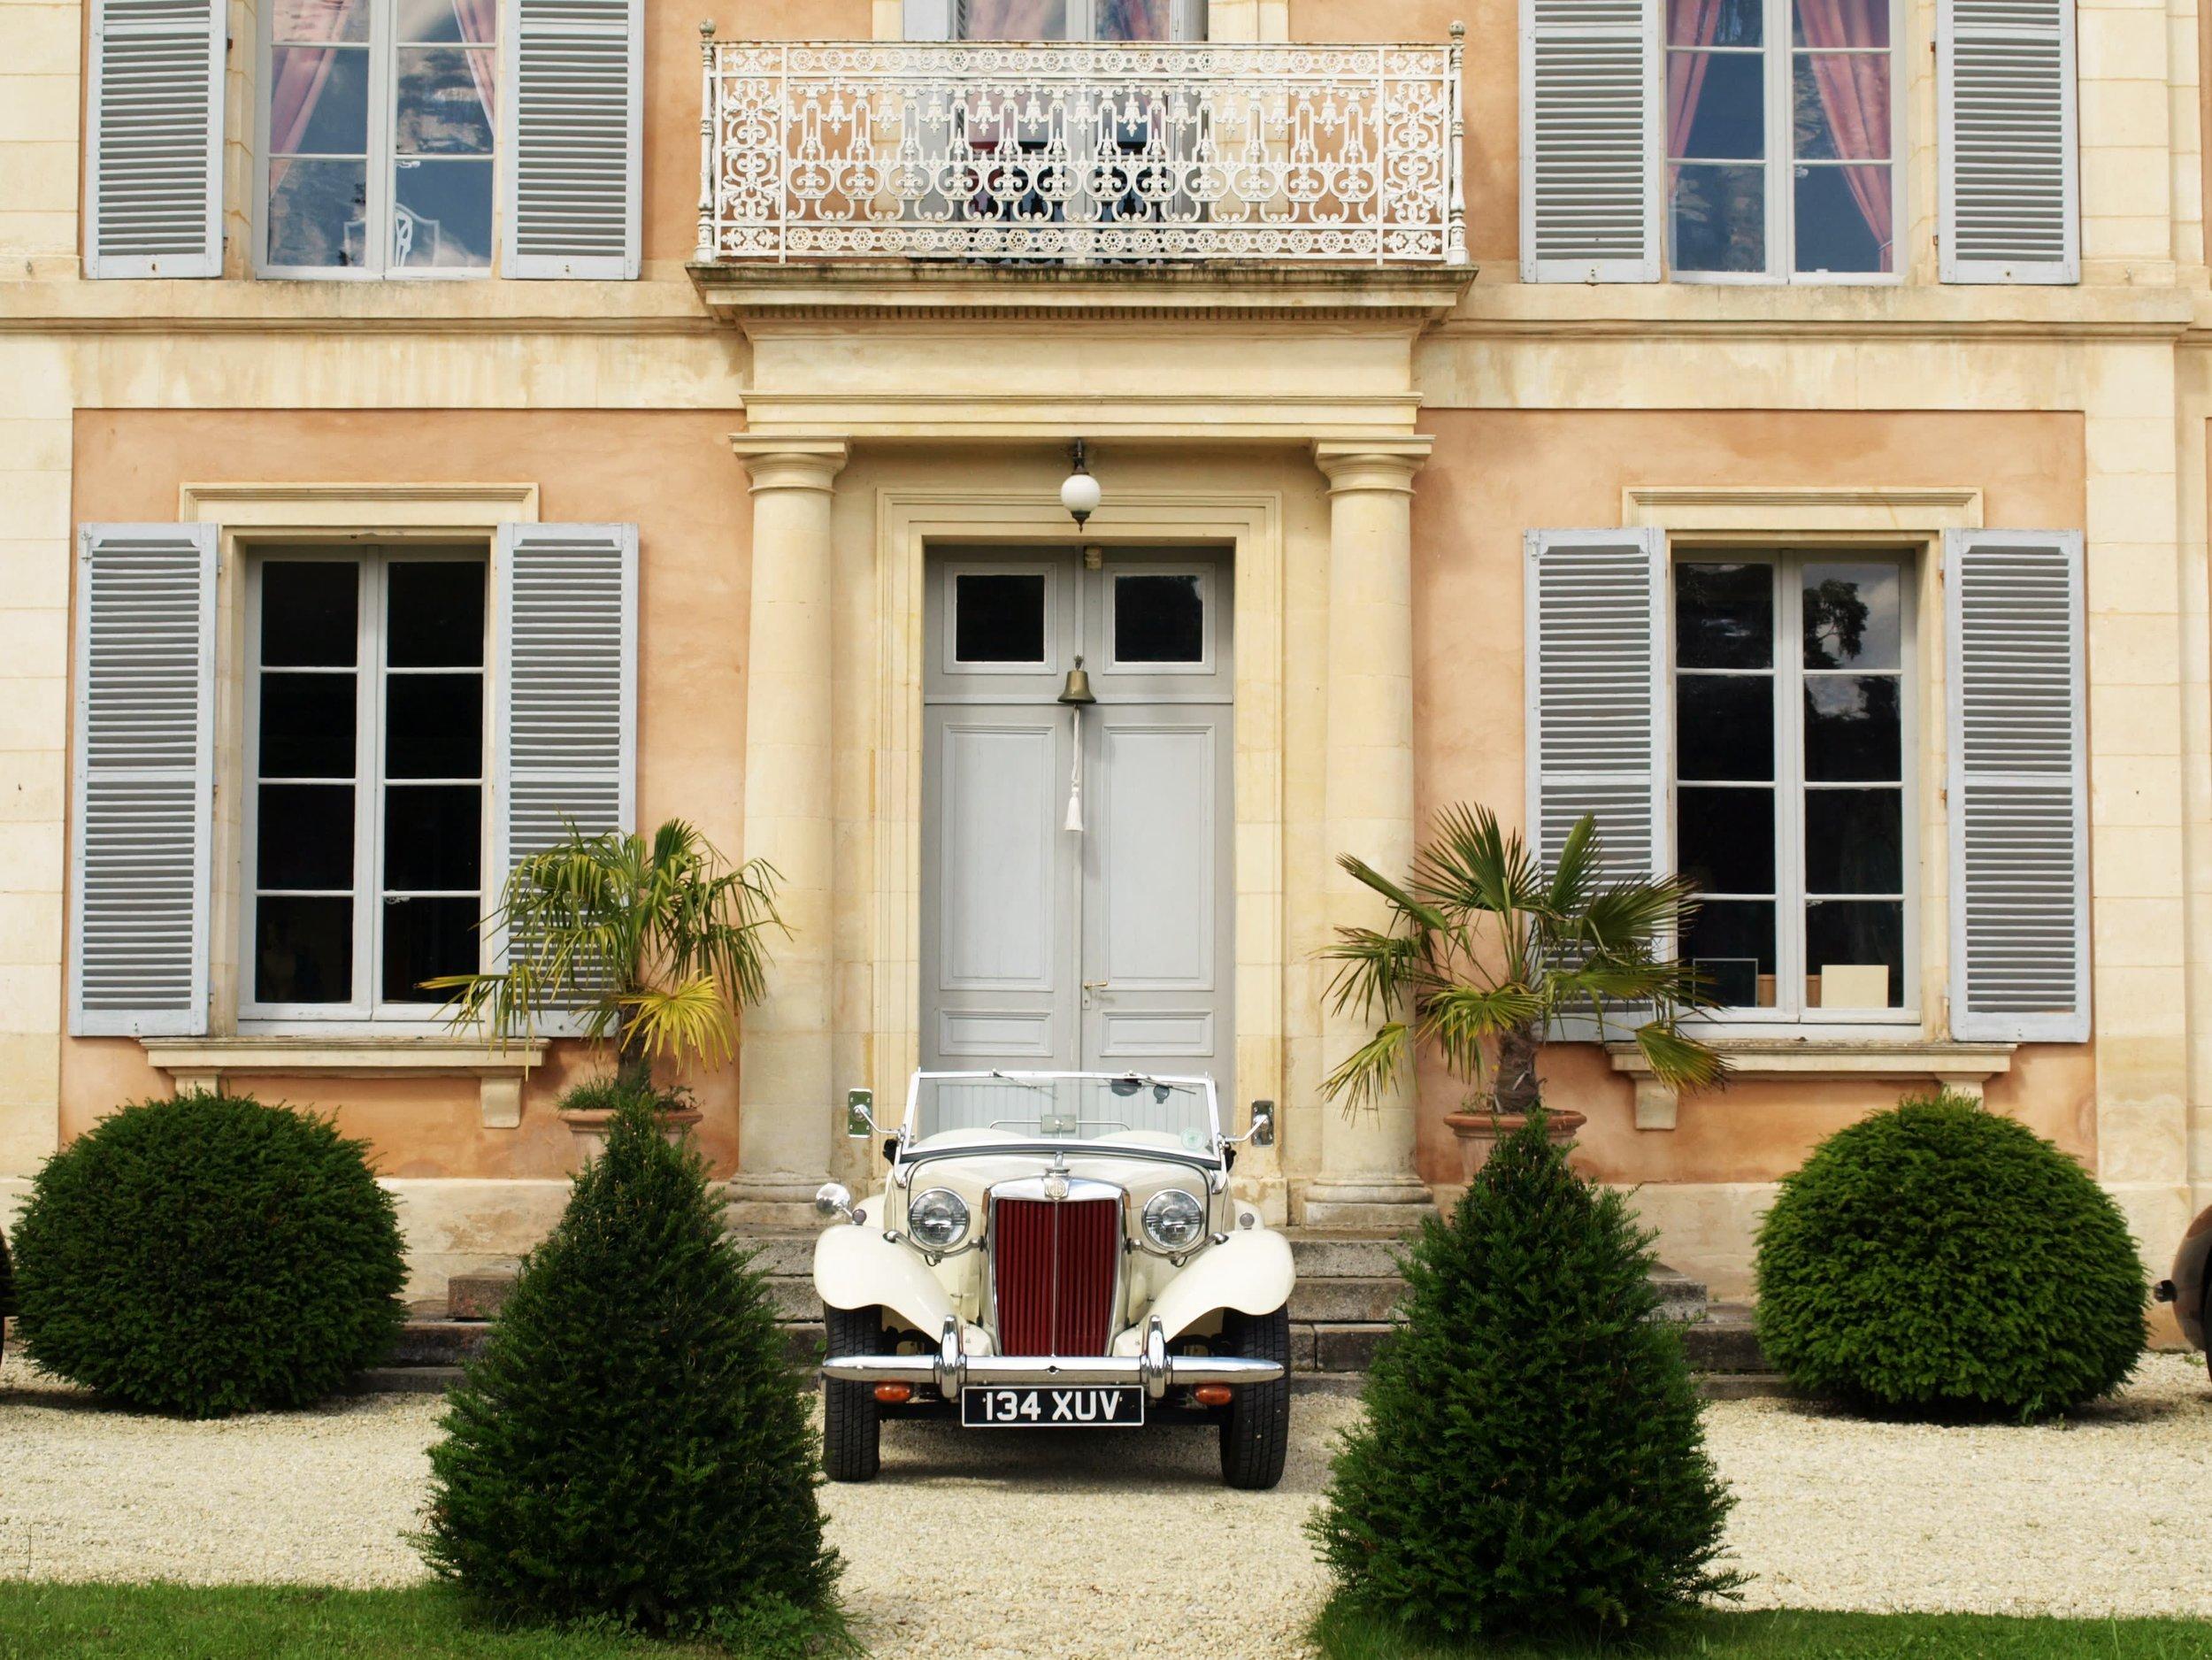 Chateau de la Pommeraye - charming boutique hotel chateau b&b spa normandy calvados 4(1).jpg